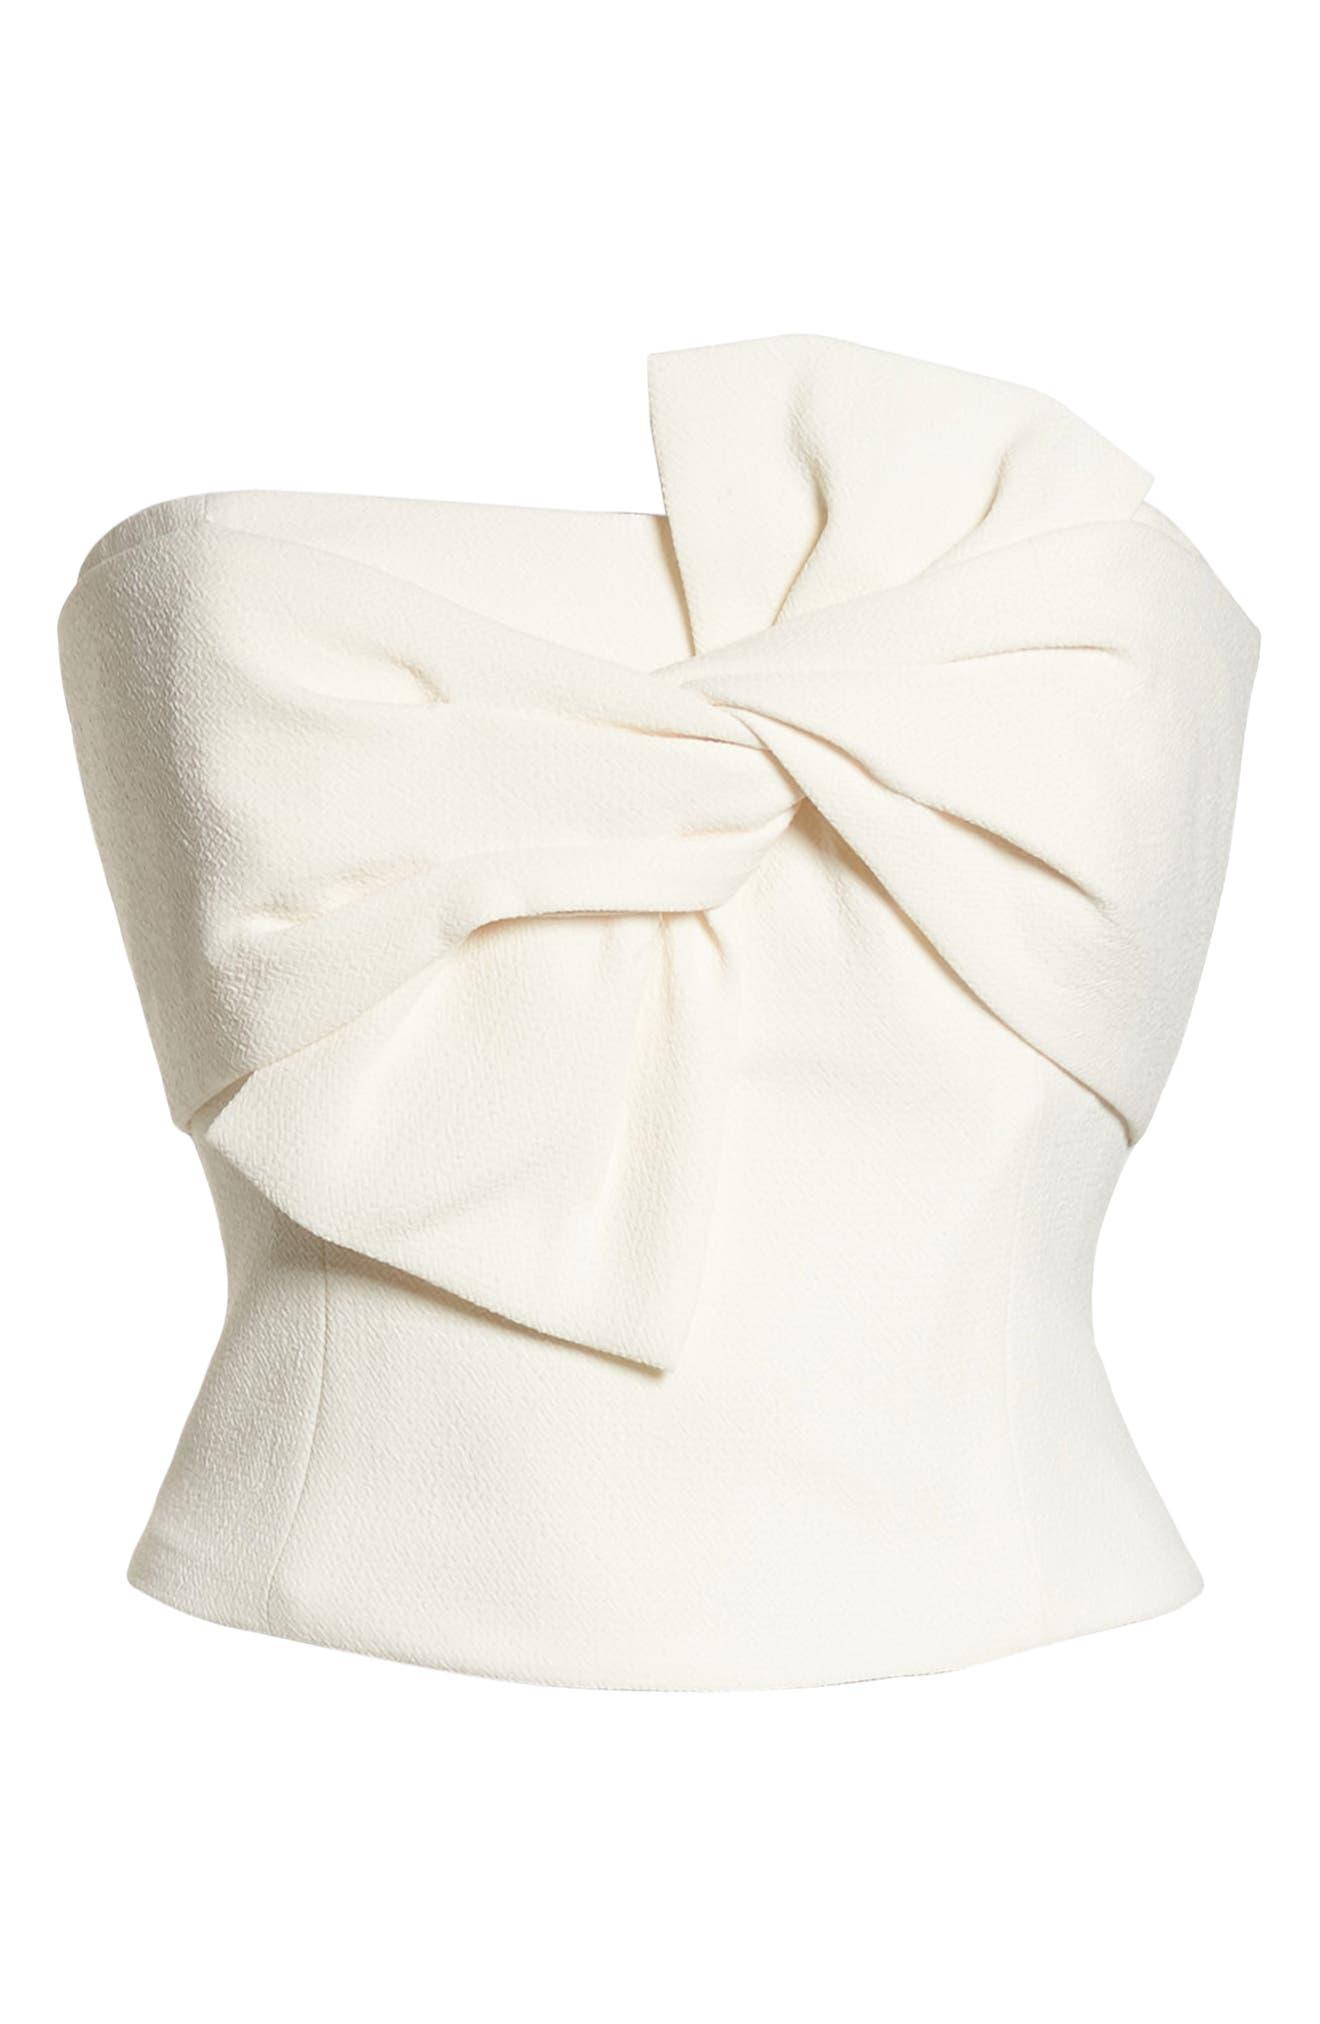 Strapless Bow Crepe Top,                             Alternate thumbnail 7, color,                             White